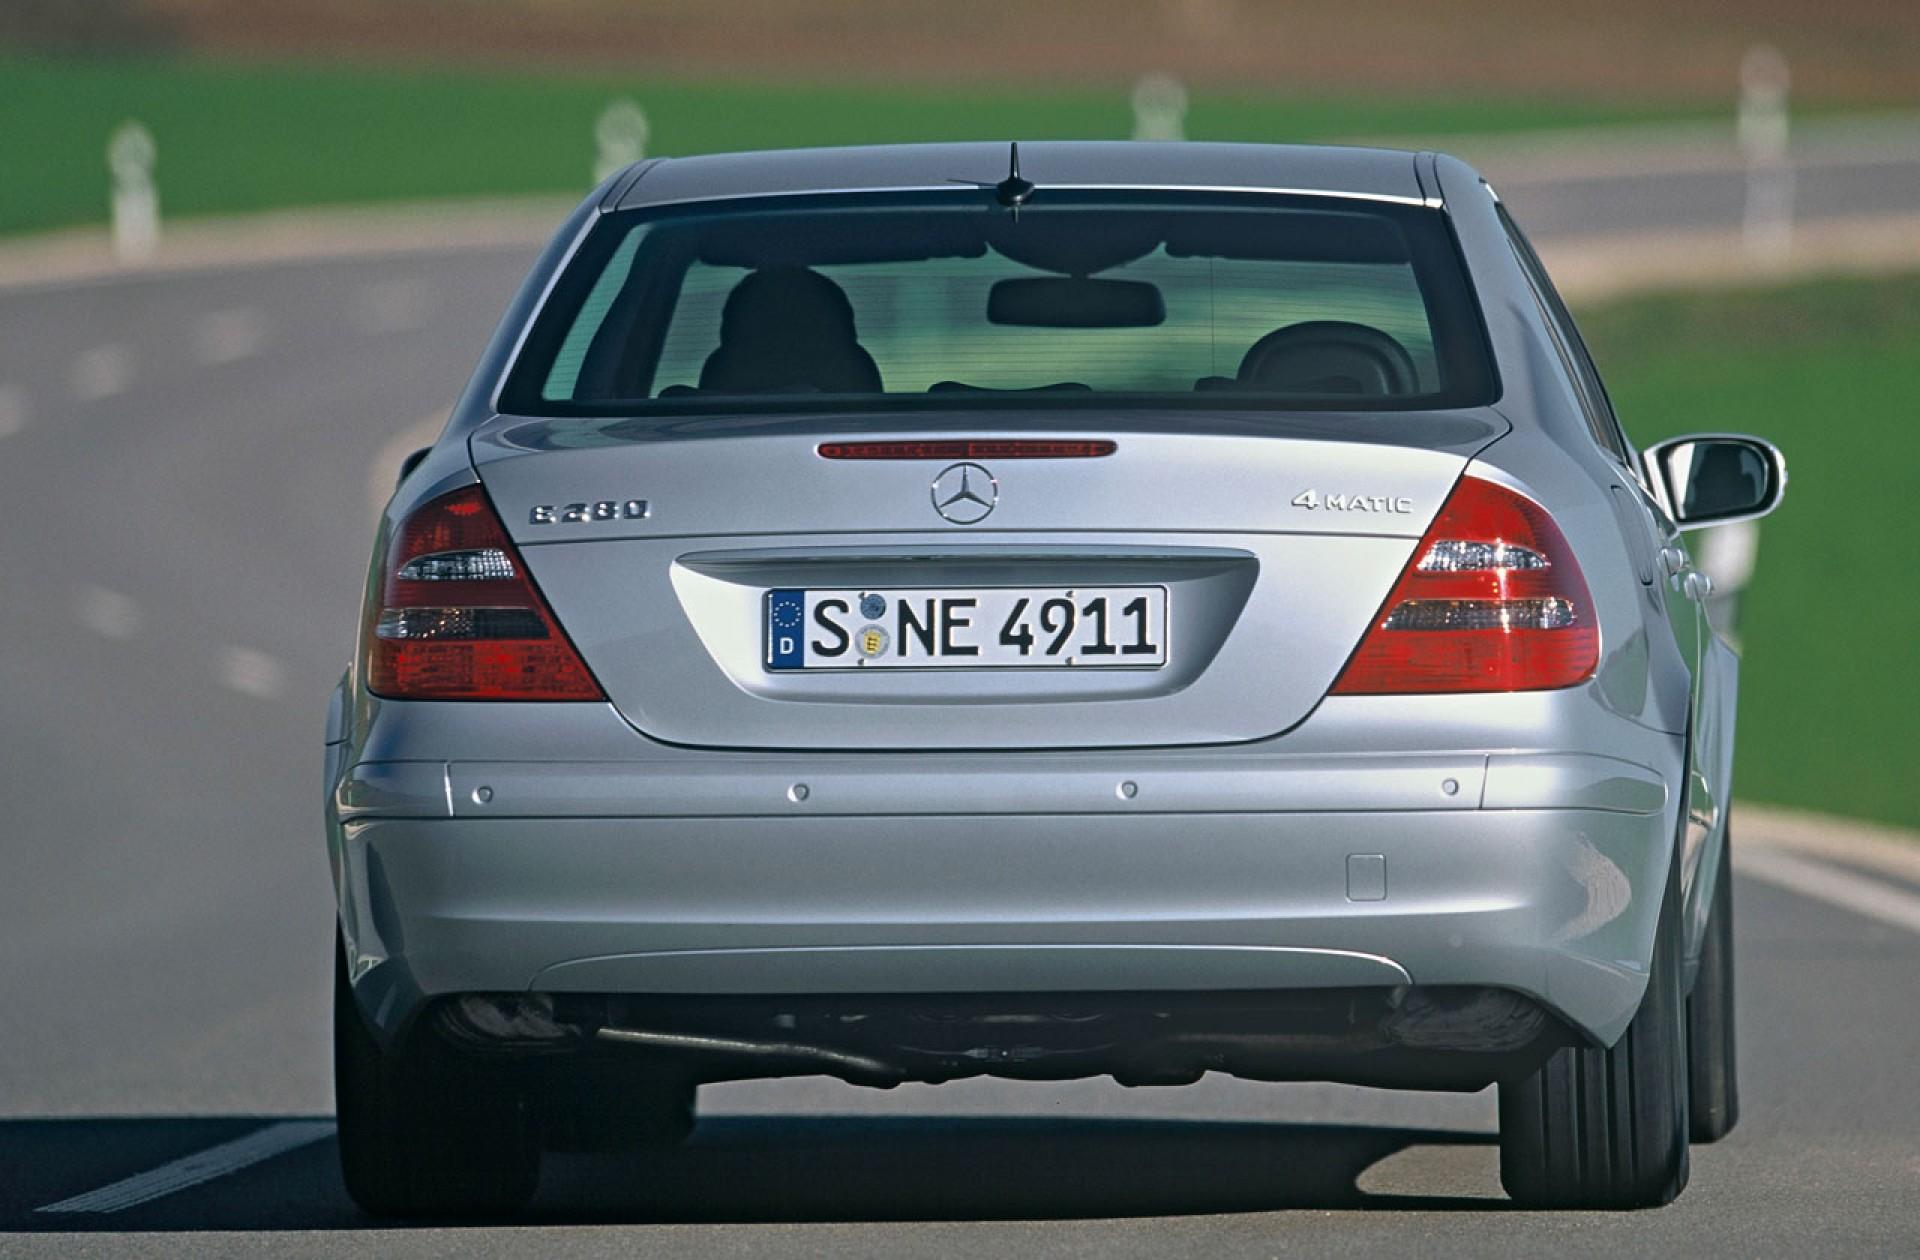 Не работает система «Дистроник» (Distronic) в Mercedes E-Class (W211)